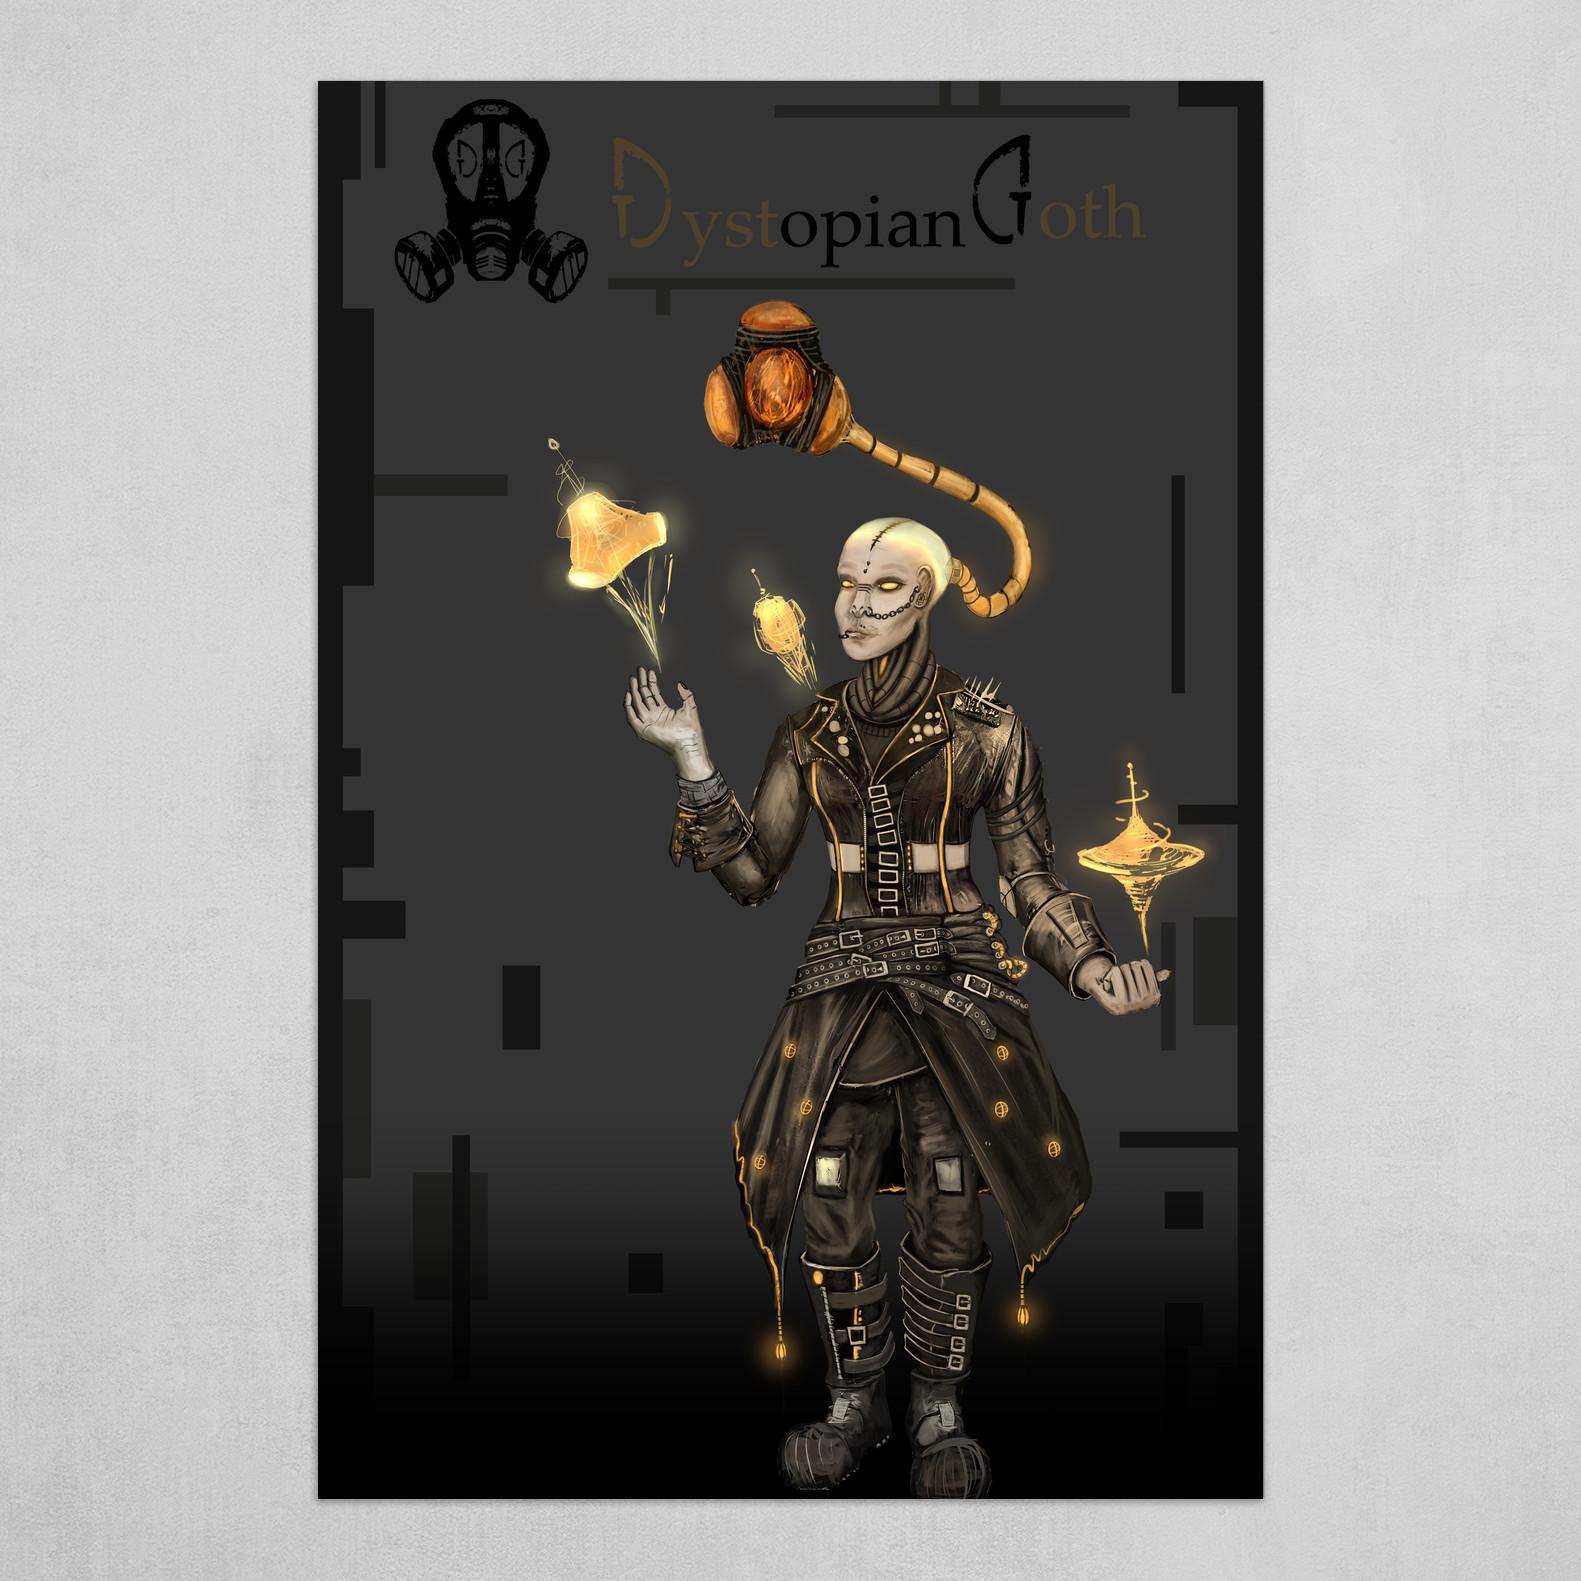 Dystopian Goth | Character_03 - Benevolent